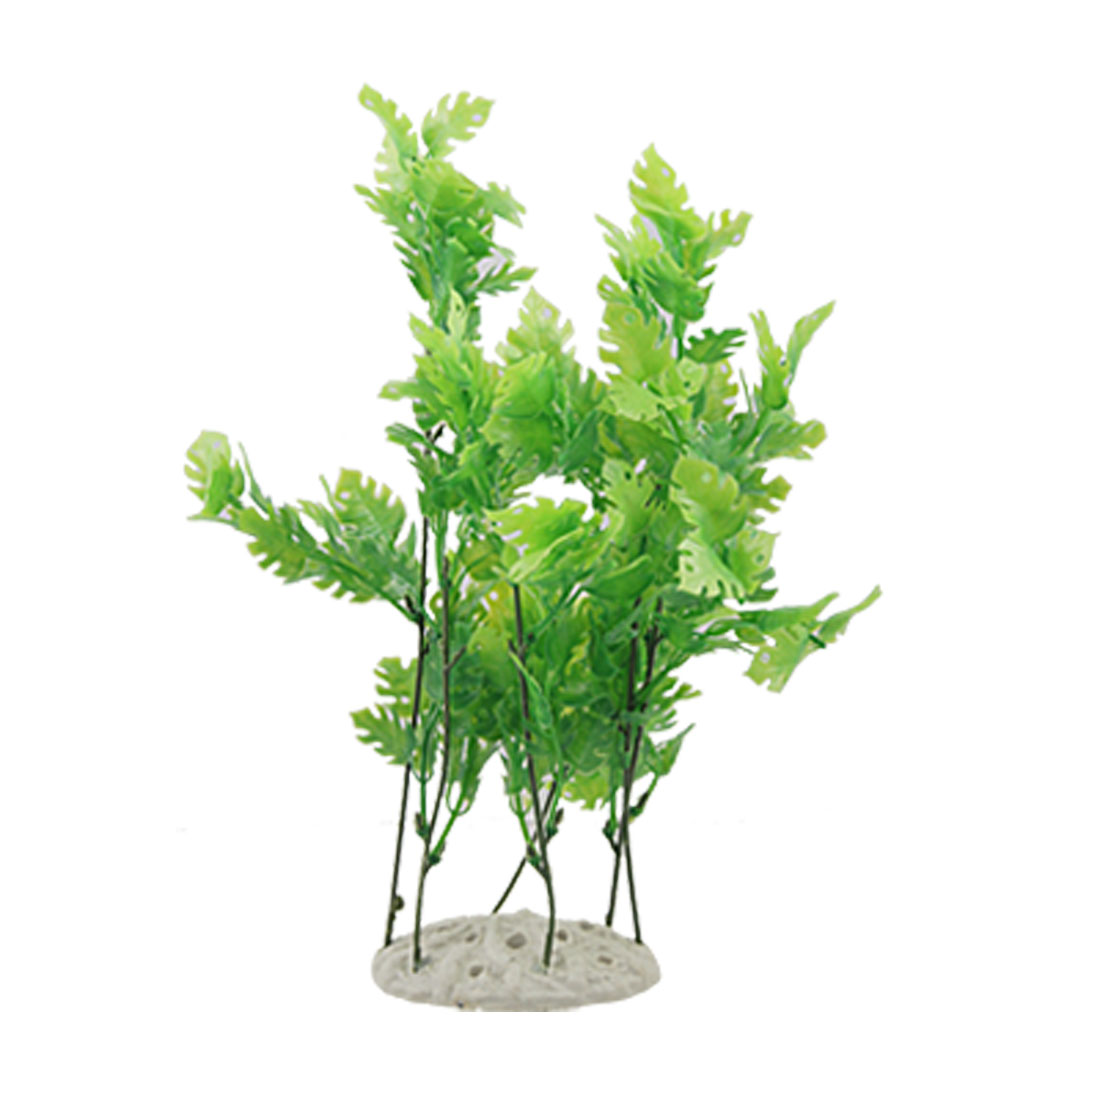 Green Leafs Plastic Plants Ornament w Ceramic Base for Aquarium